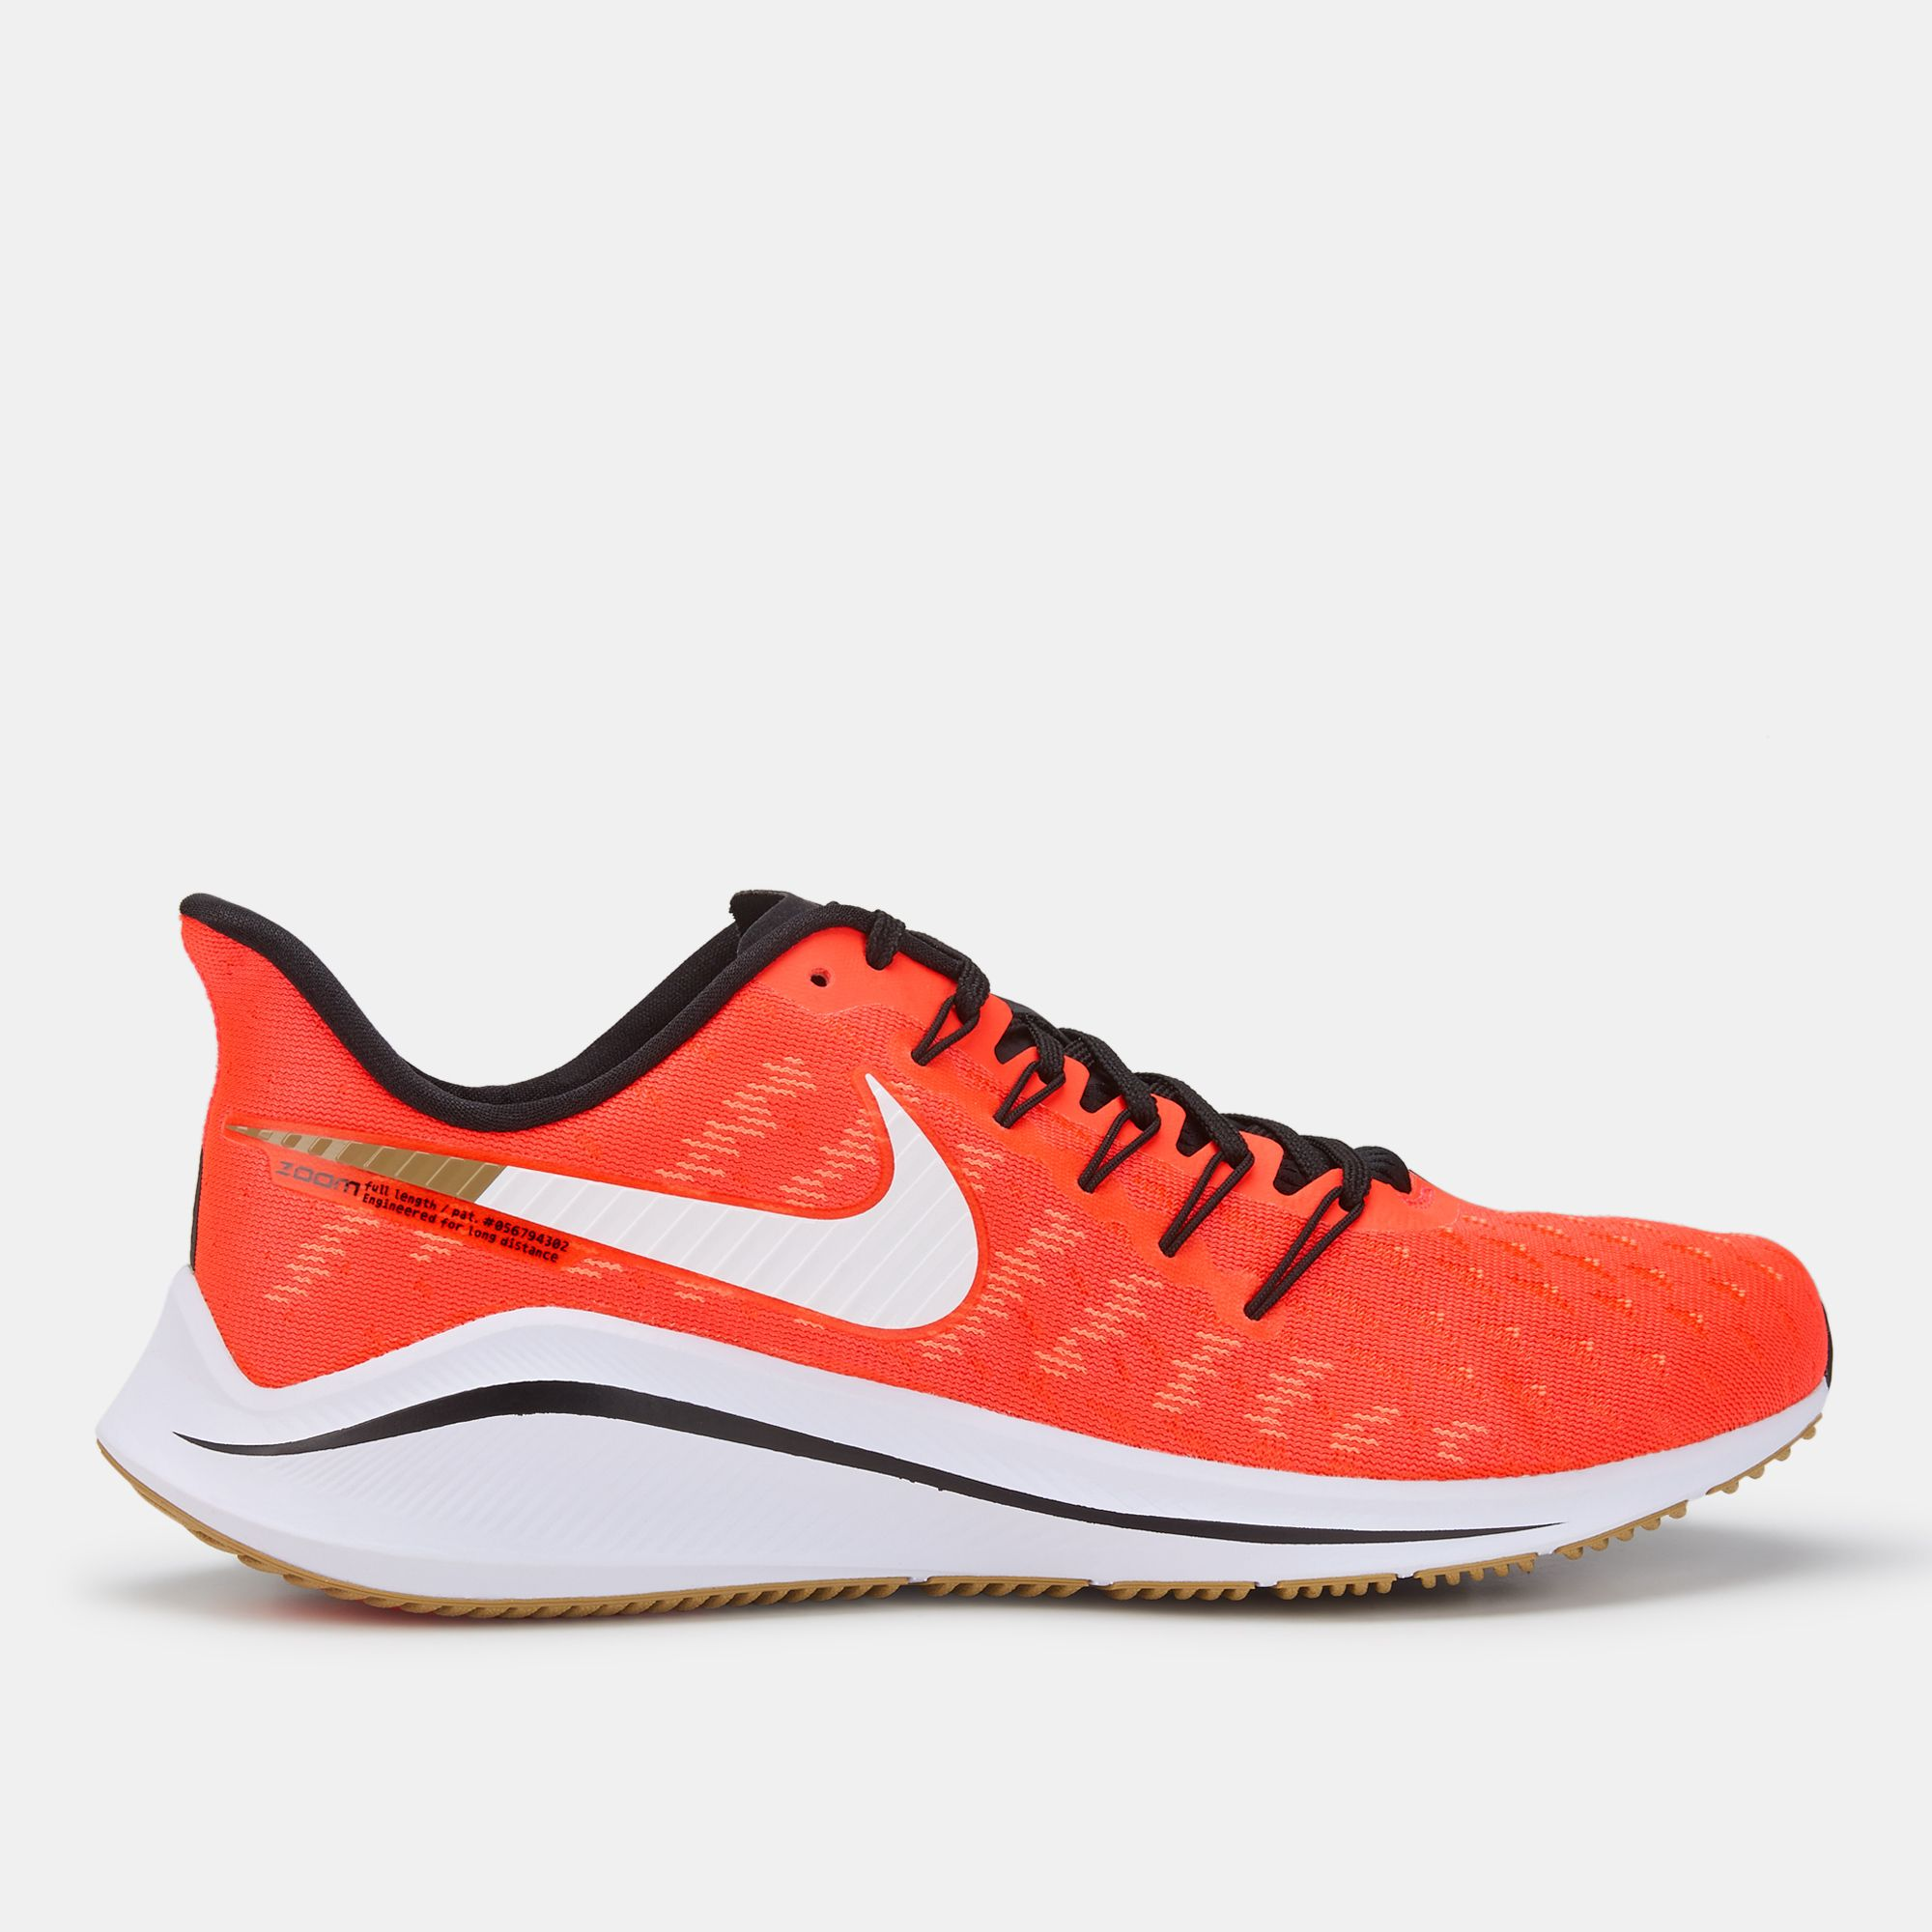 ede06f7db02 Nike Men s Air Zoom Vomero 14 Shoe